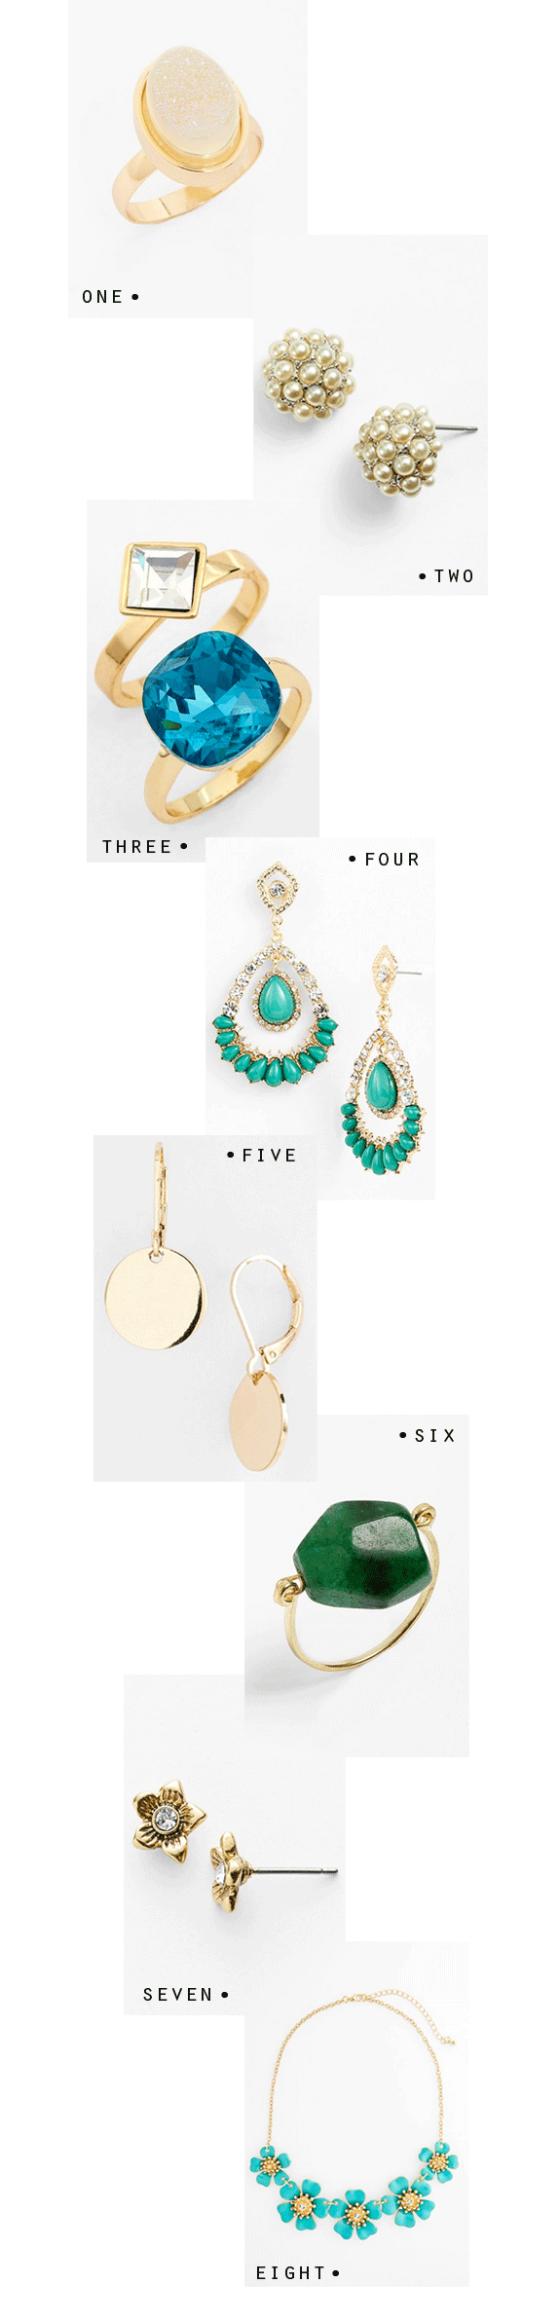 Nordstrom-Jewelry-Under-$20